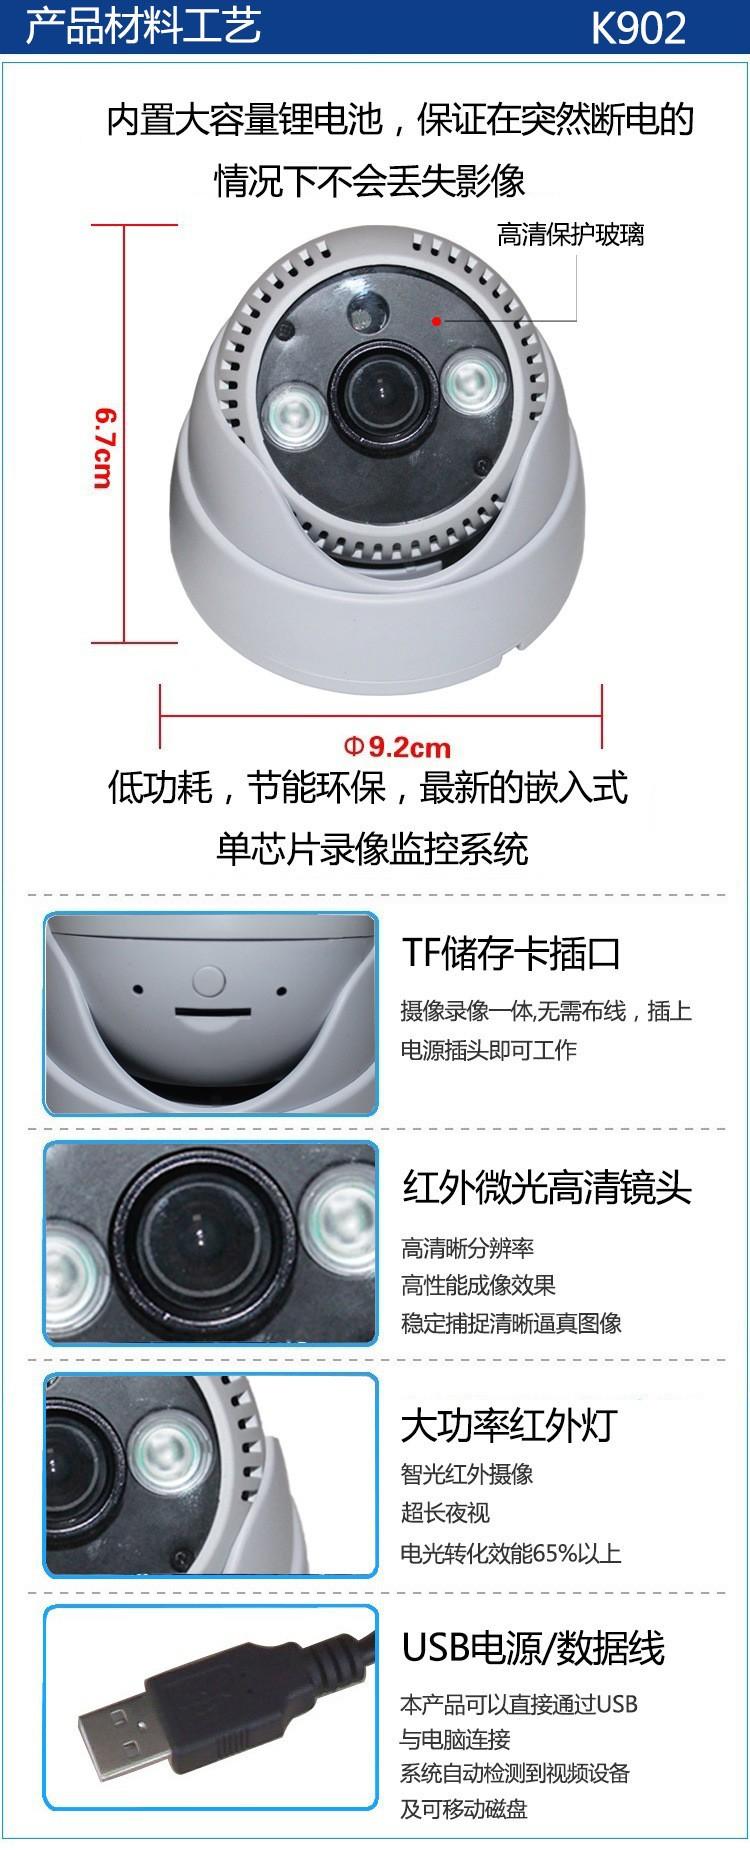 HD USB CCTV IR Camera DVR Recorder local storage Plug and Play Night Vision Dome Camera support 32GB TF card Loop recording